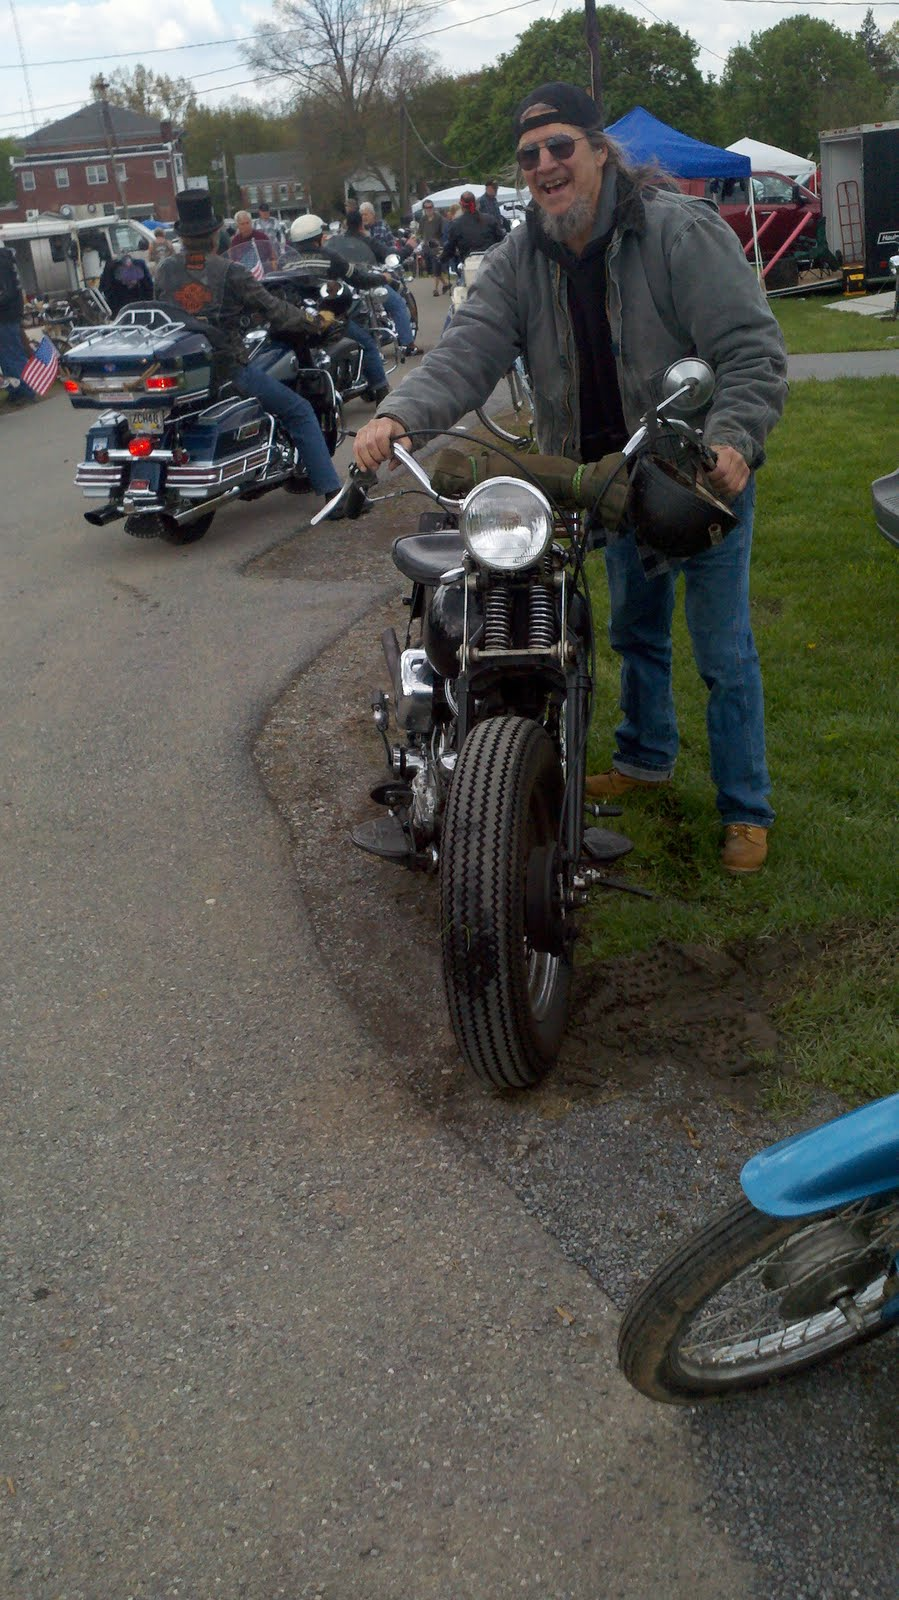 oley pennsylvania motorcycle swap meet 2014